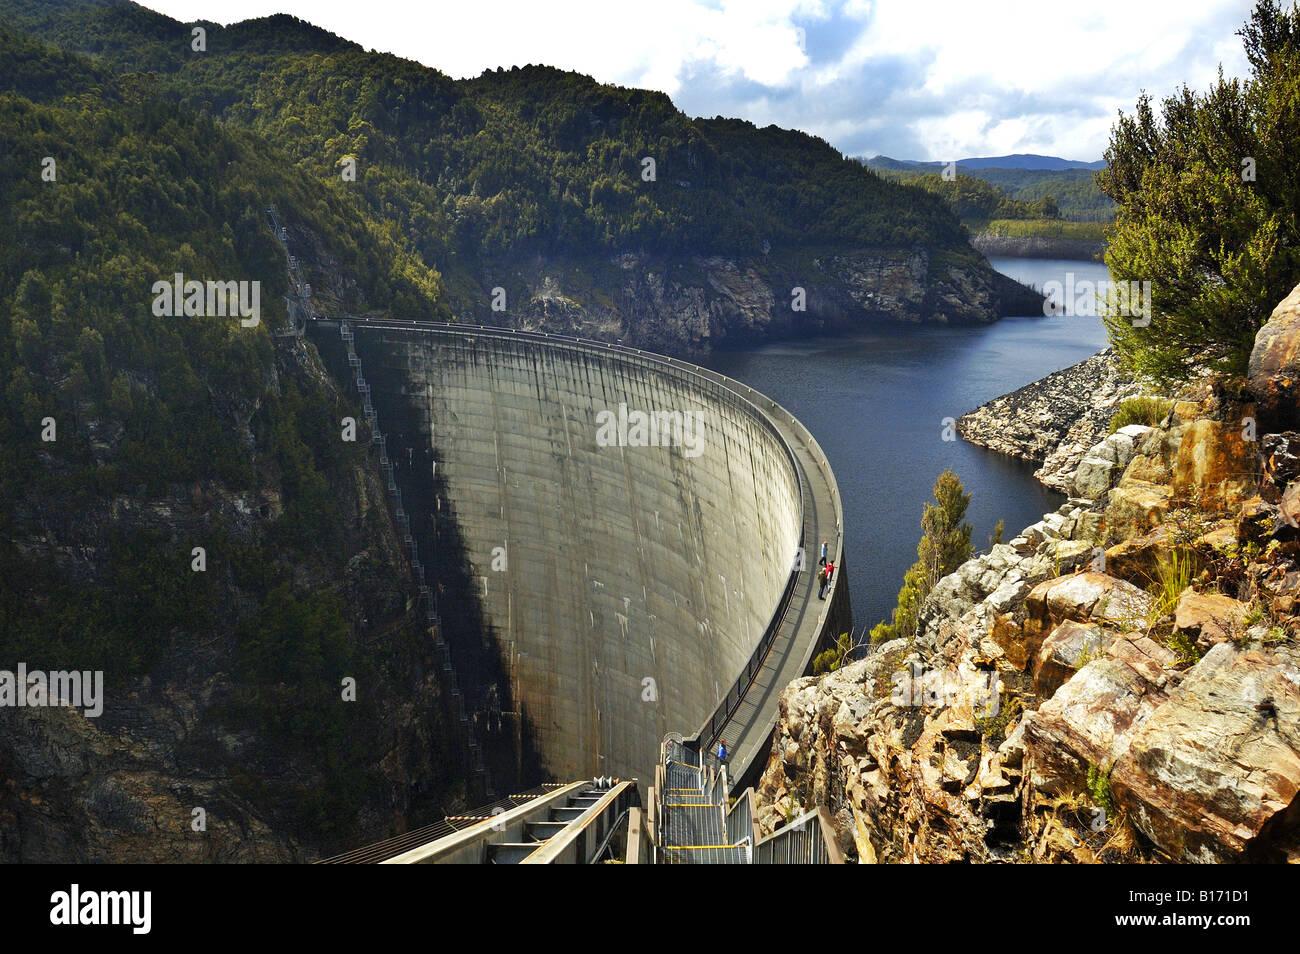 hight resolution of people on the gordon dam tasmania australia stock image